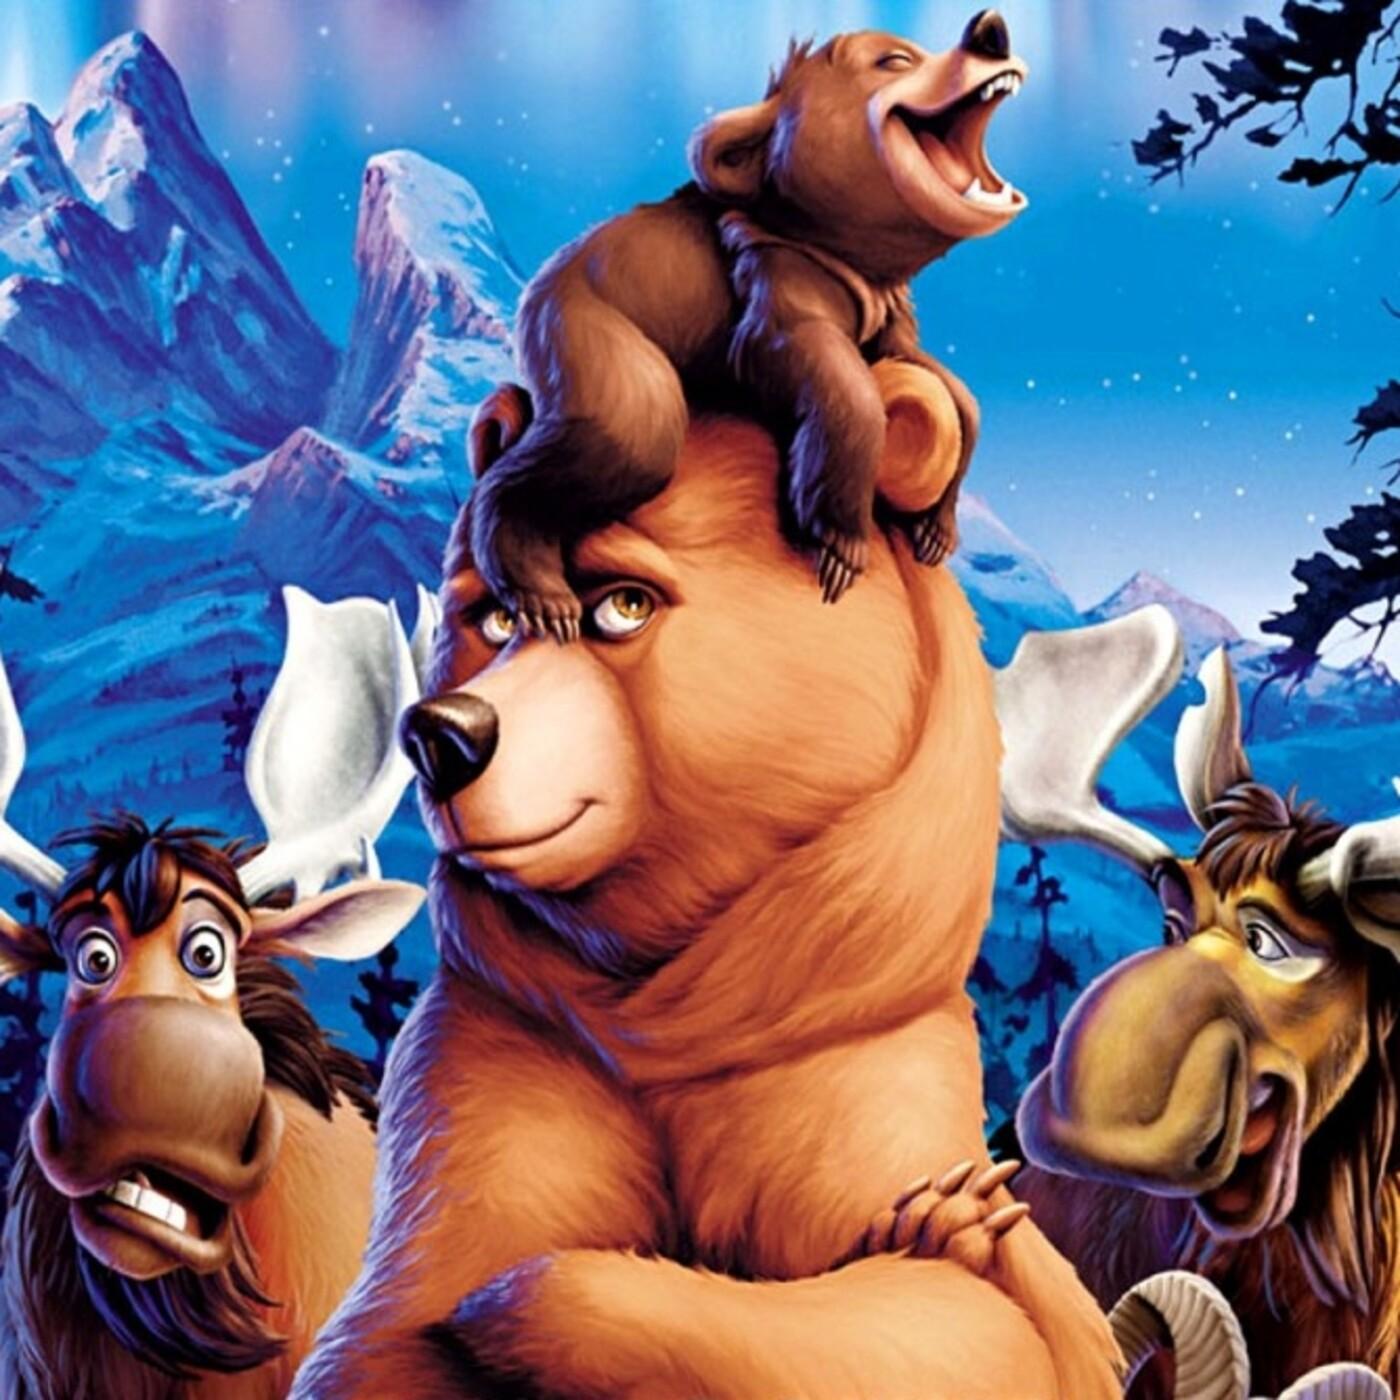 cartoon cartoon cast 64 - tierra de osos (brother bear)